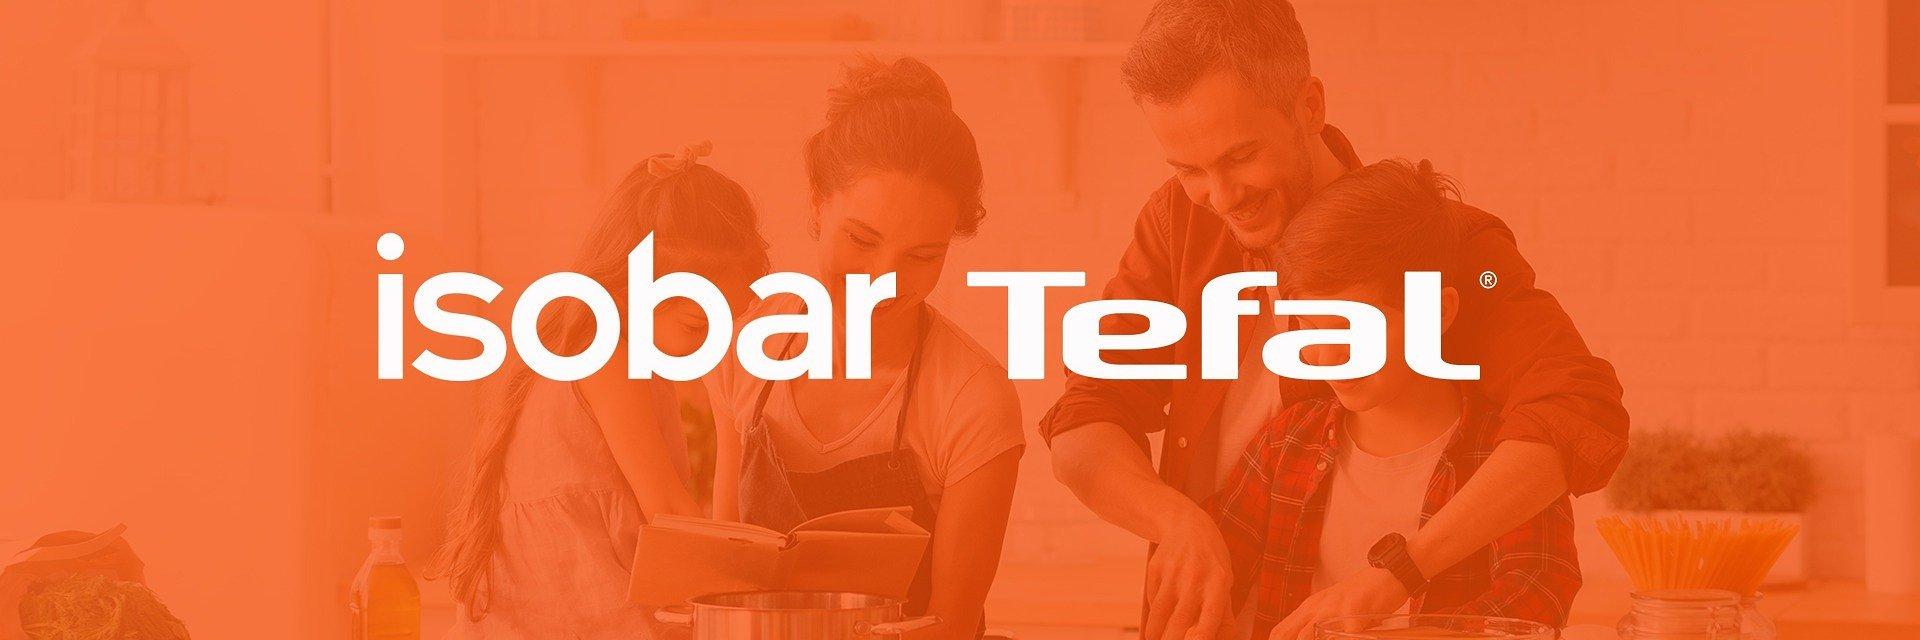 Isobar Polska wygrywa przetarg marki Tefal (Groupe Seb)